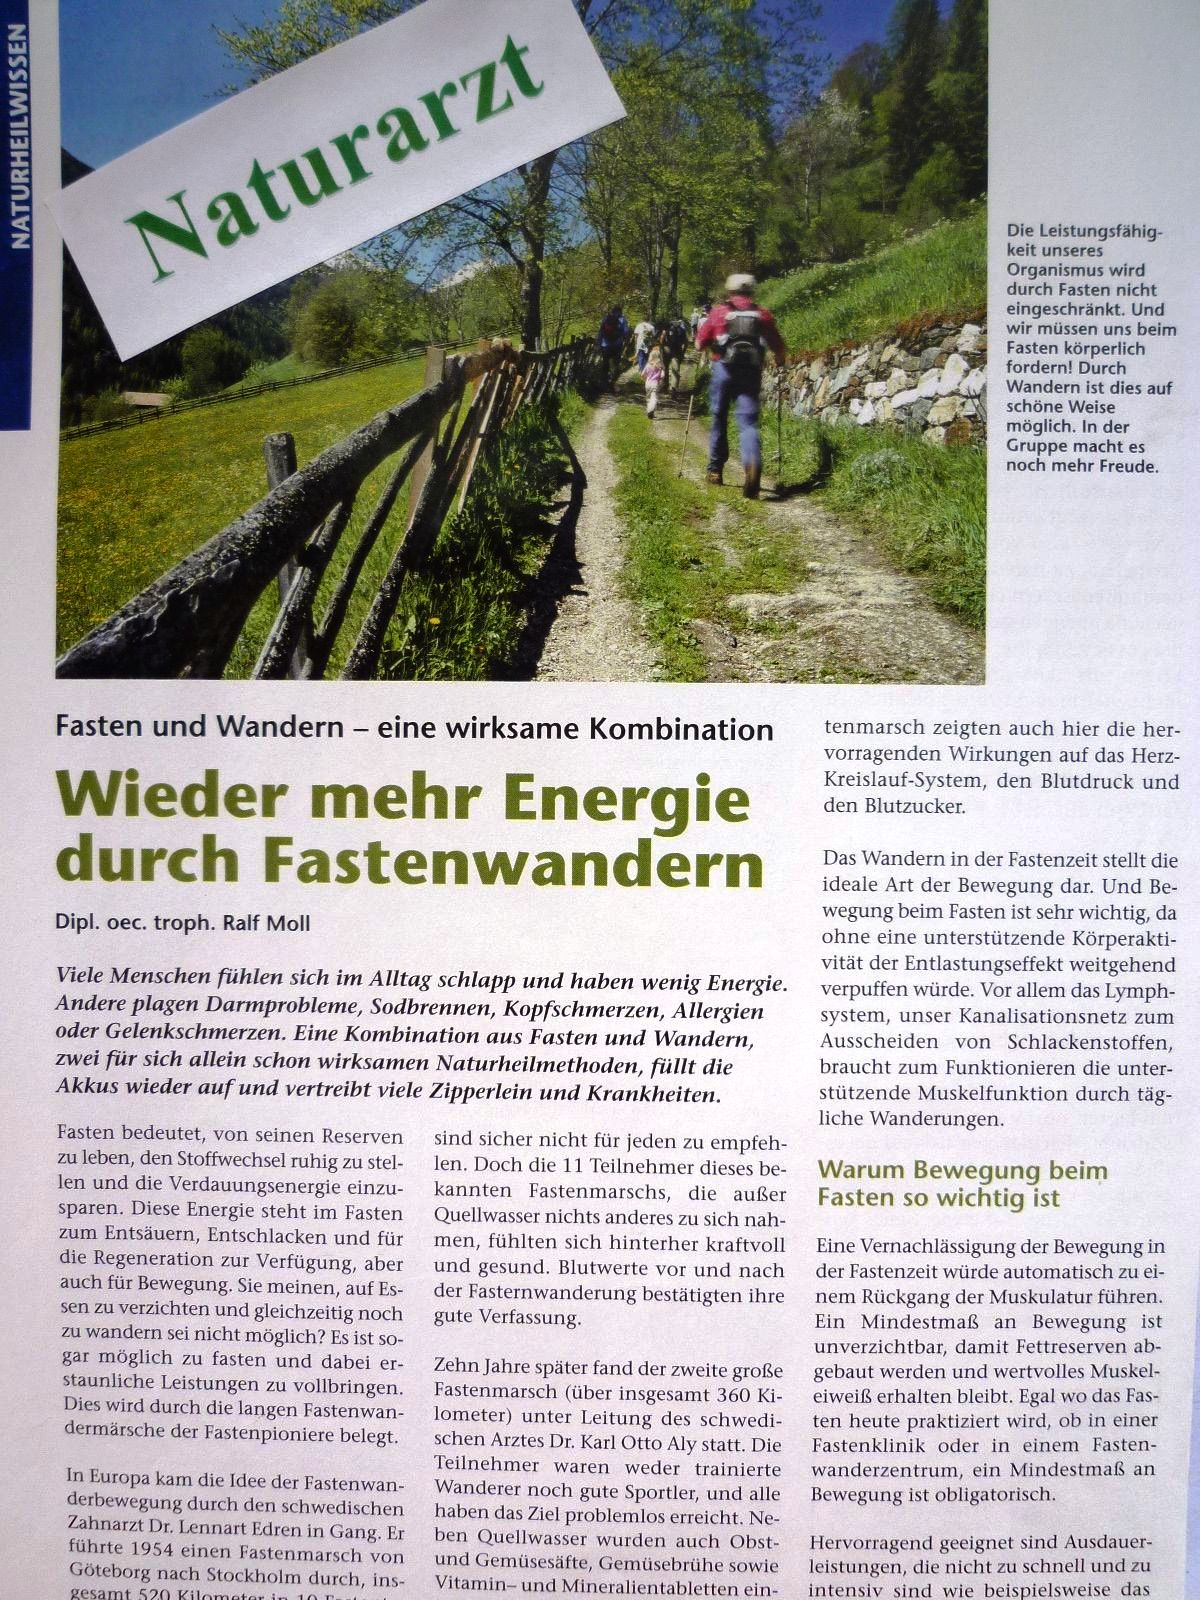 Zeitschrift Naturarzt 03/10